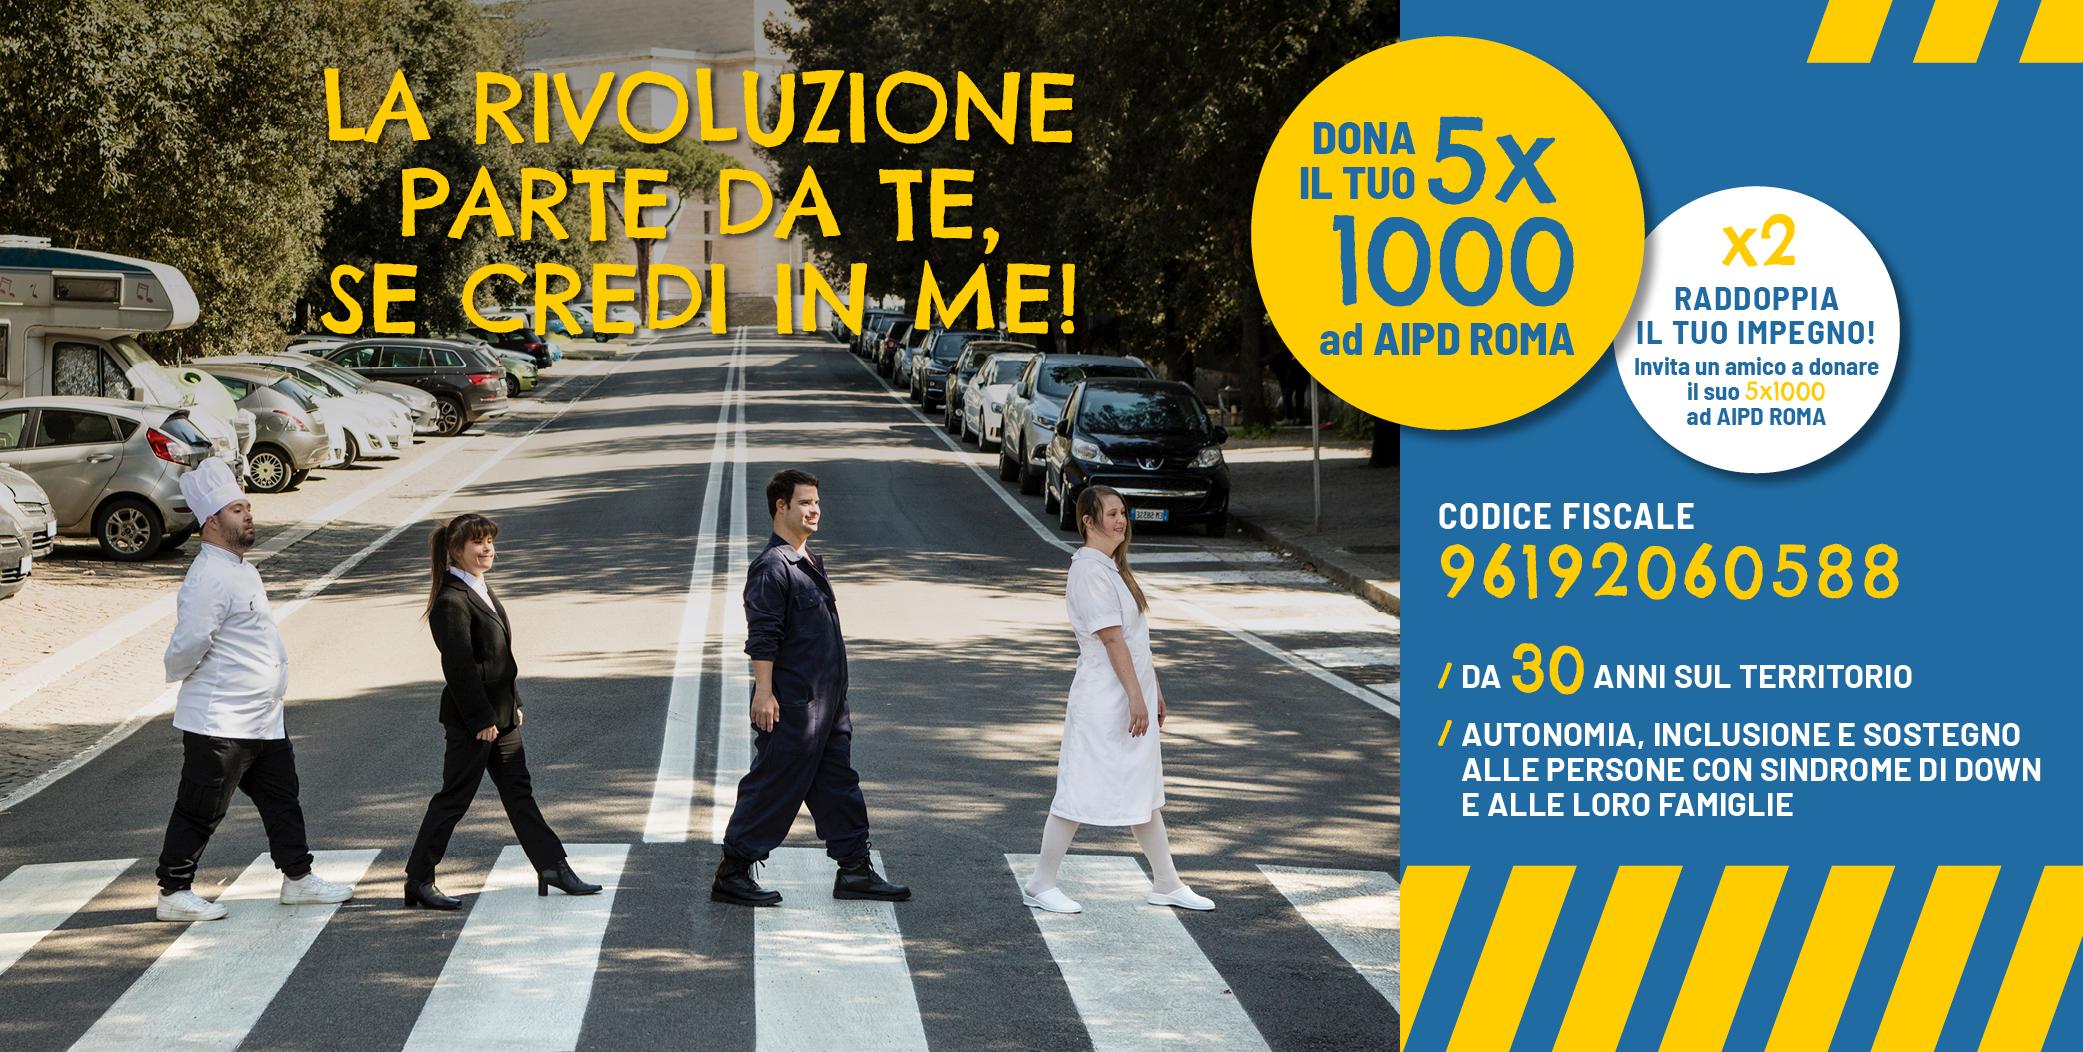 5x1000 aipd roma